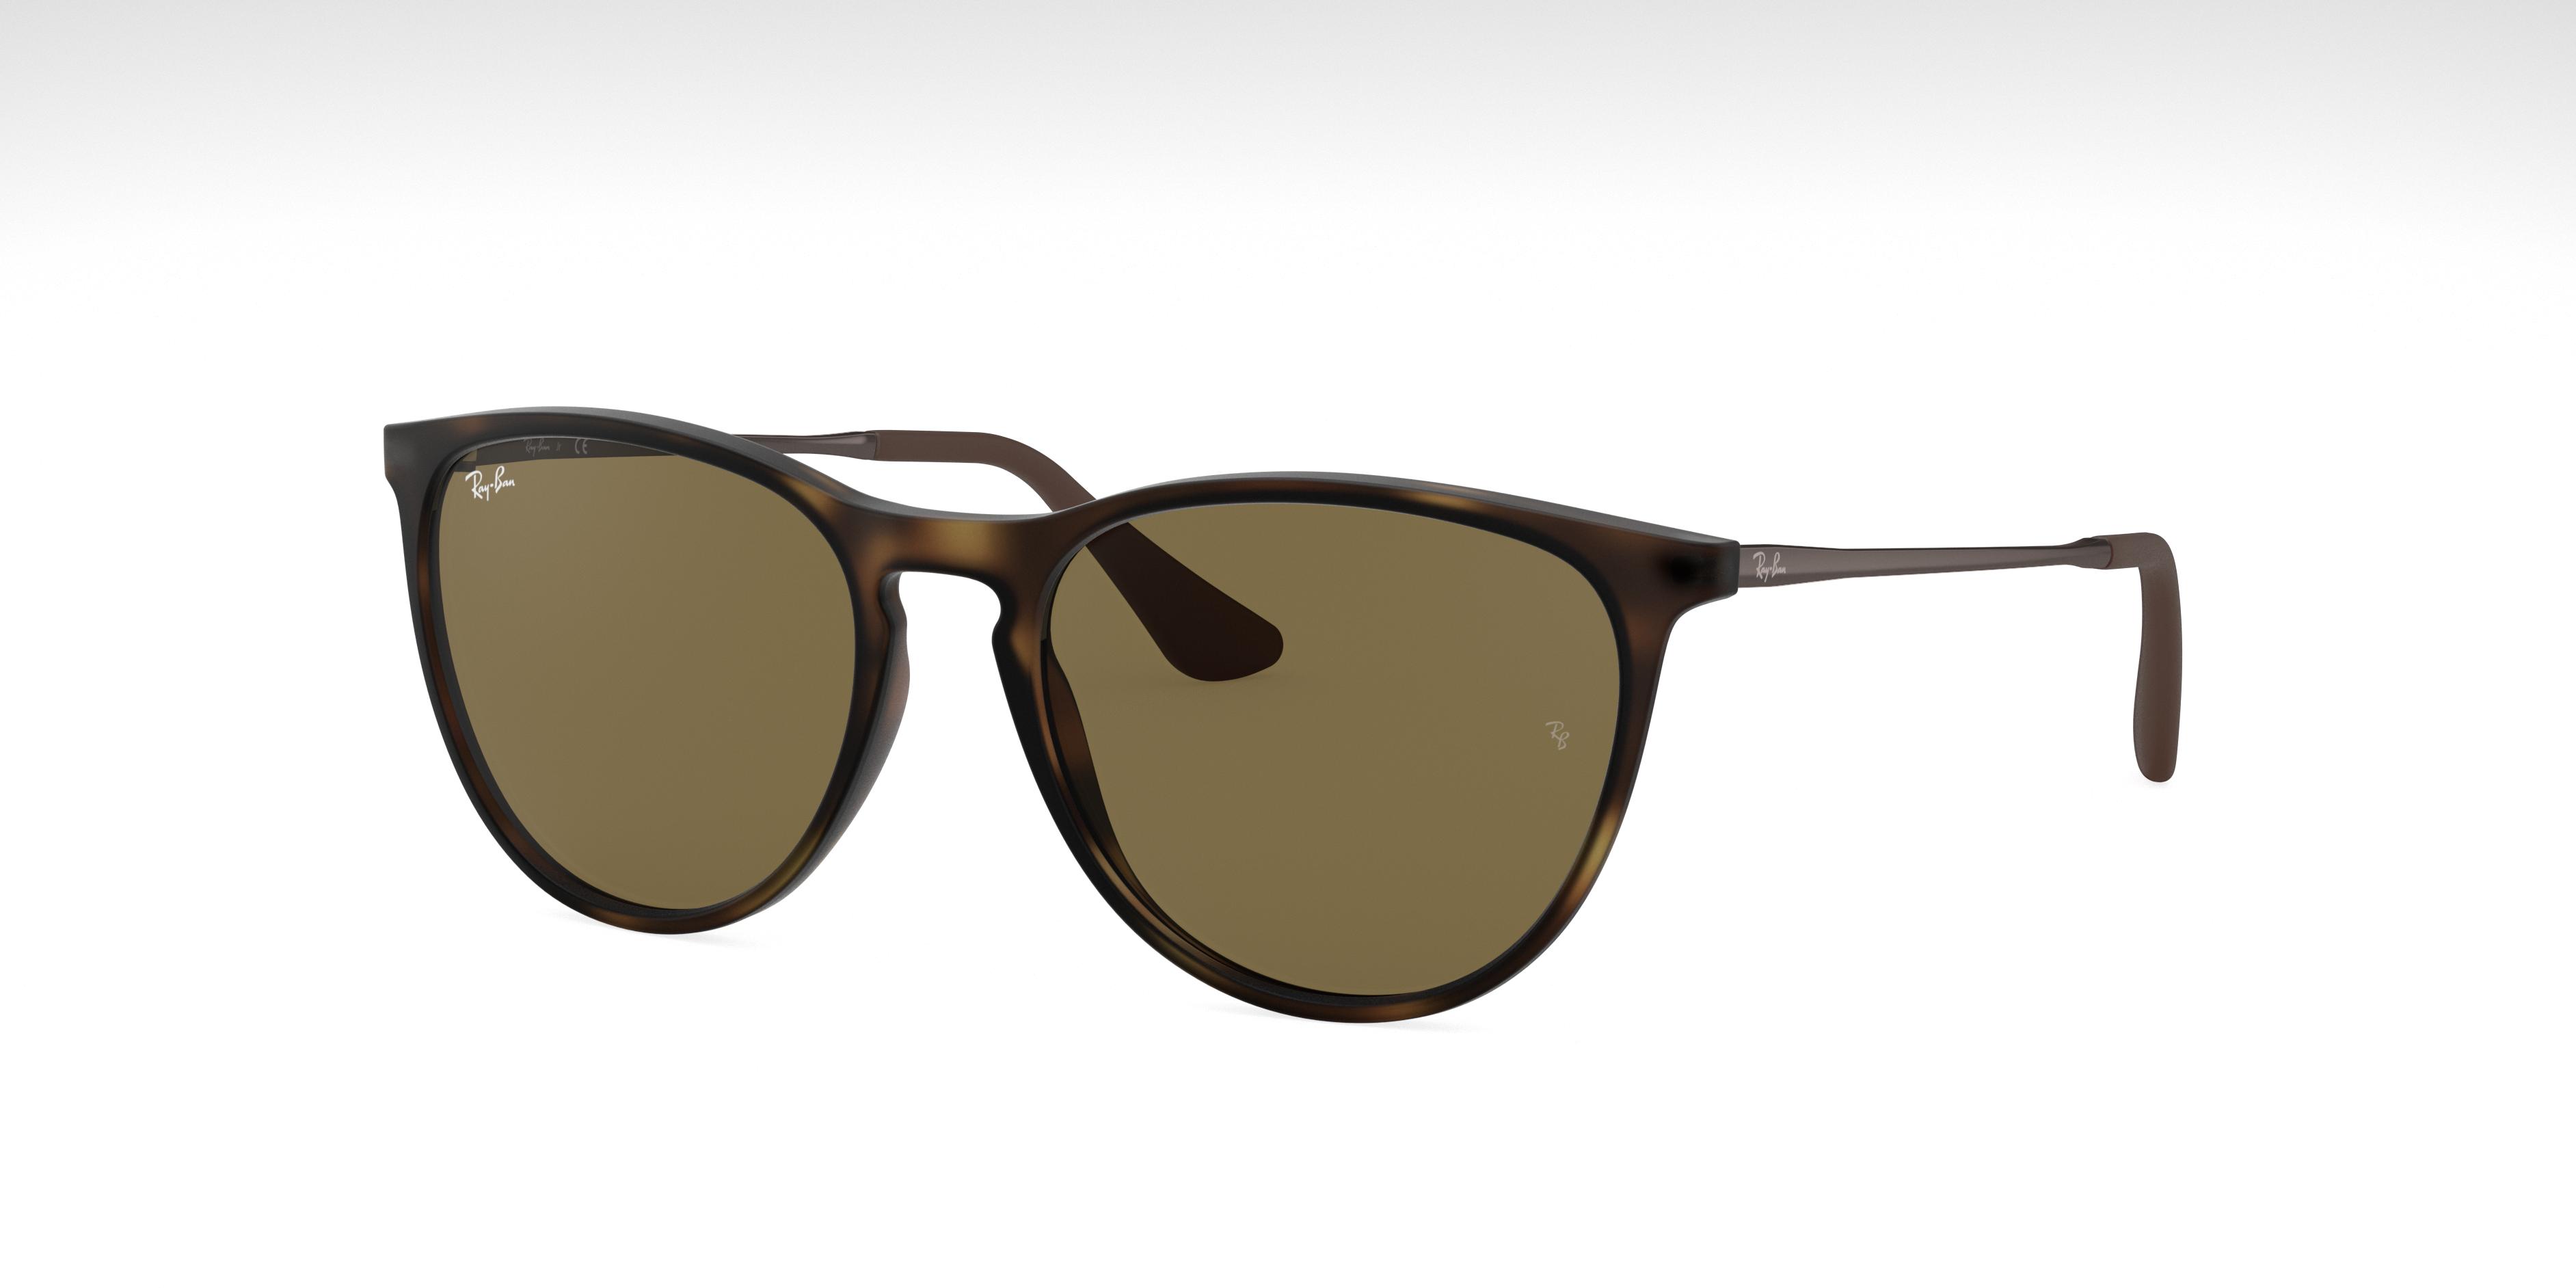 Ray-Ban Izzy Gunmetal, Brown Lenses - RJ9060S